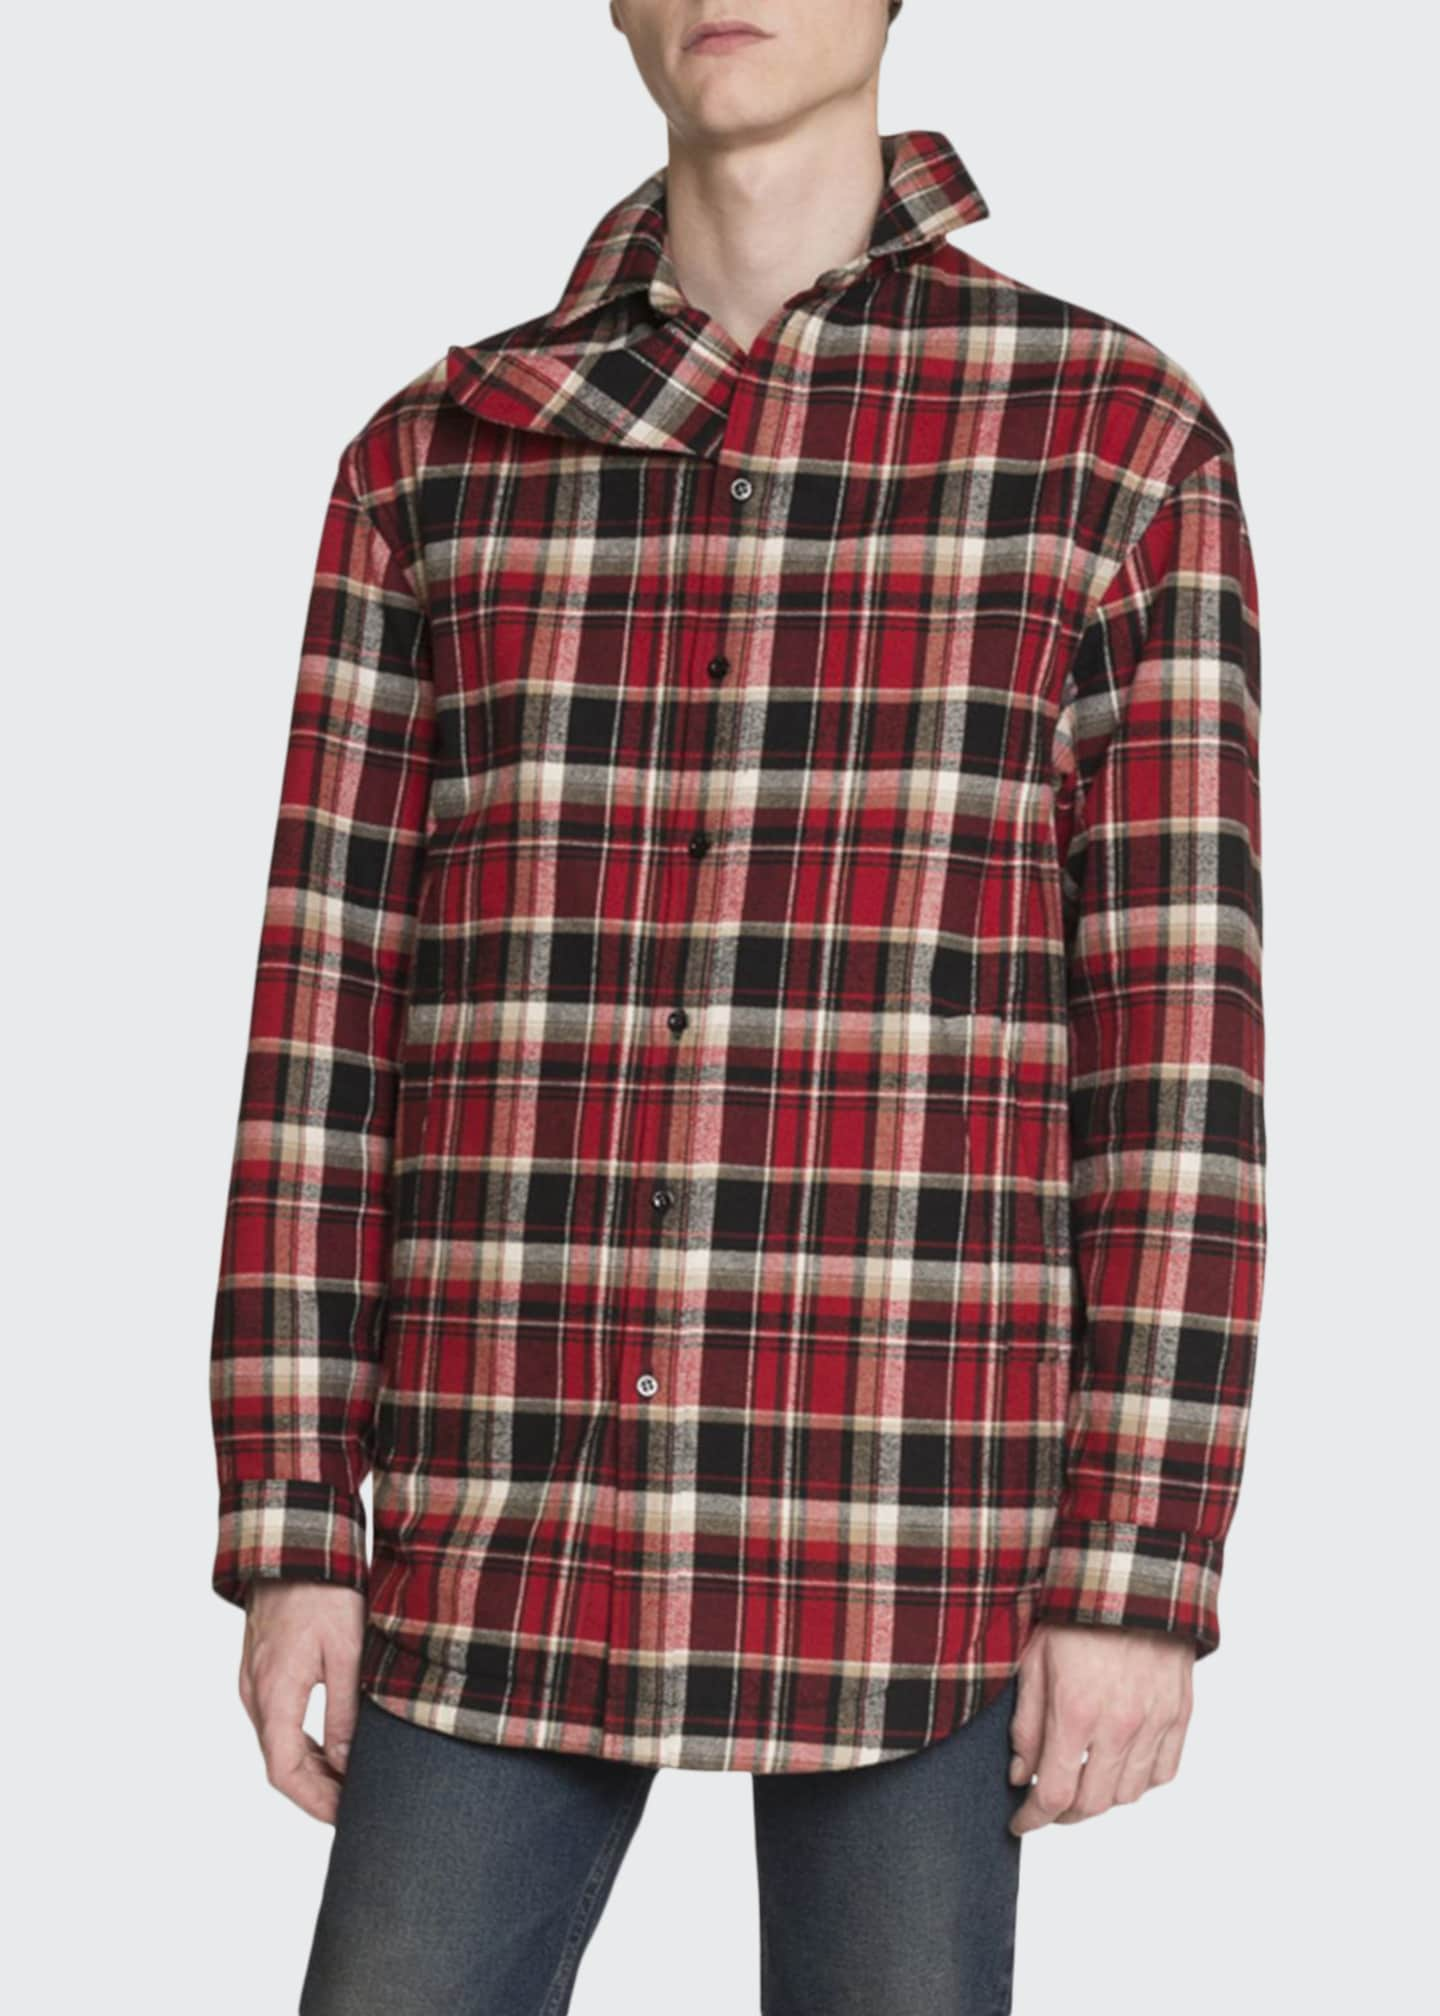 Balenciaga Men's Lightly Padded Plaid Shirt Jacket